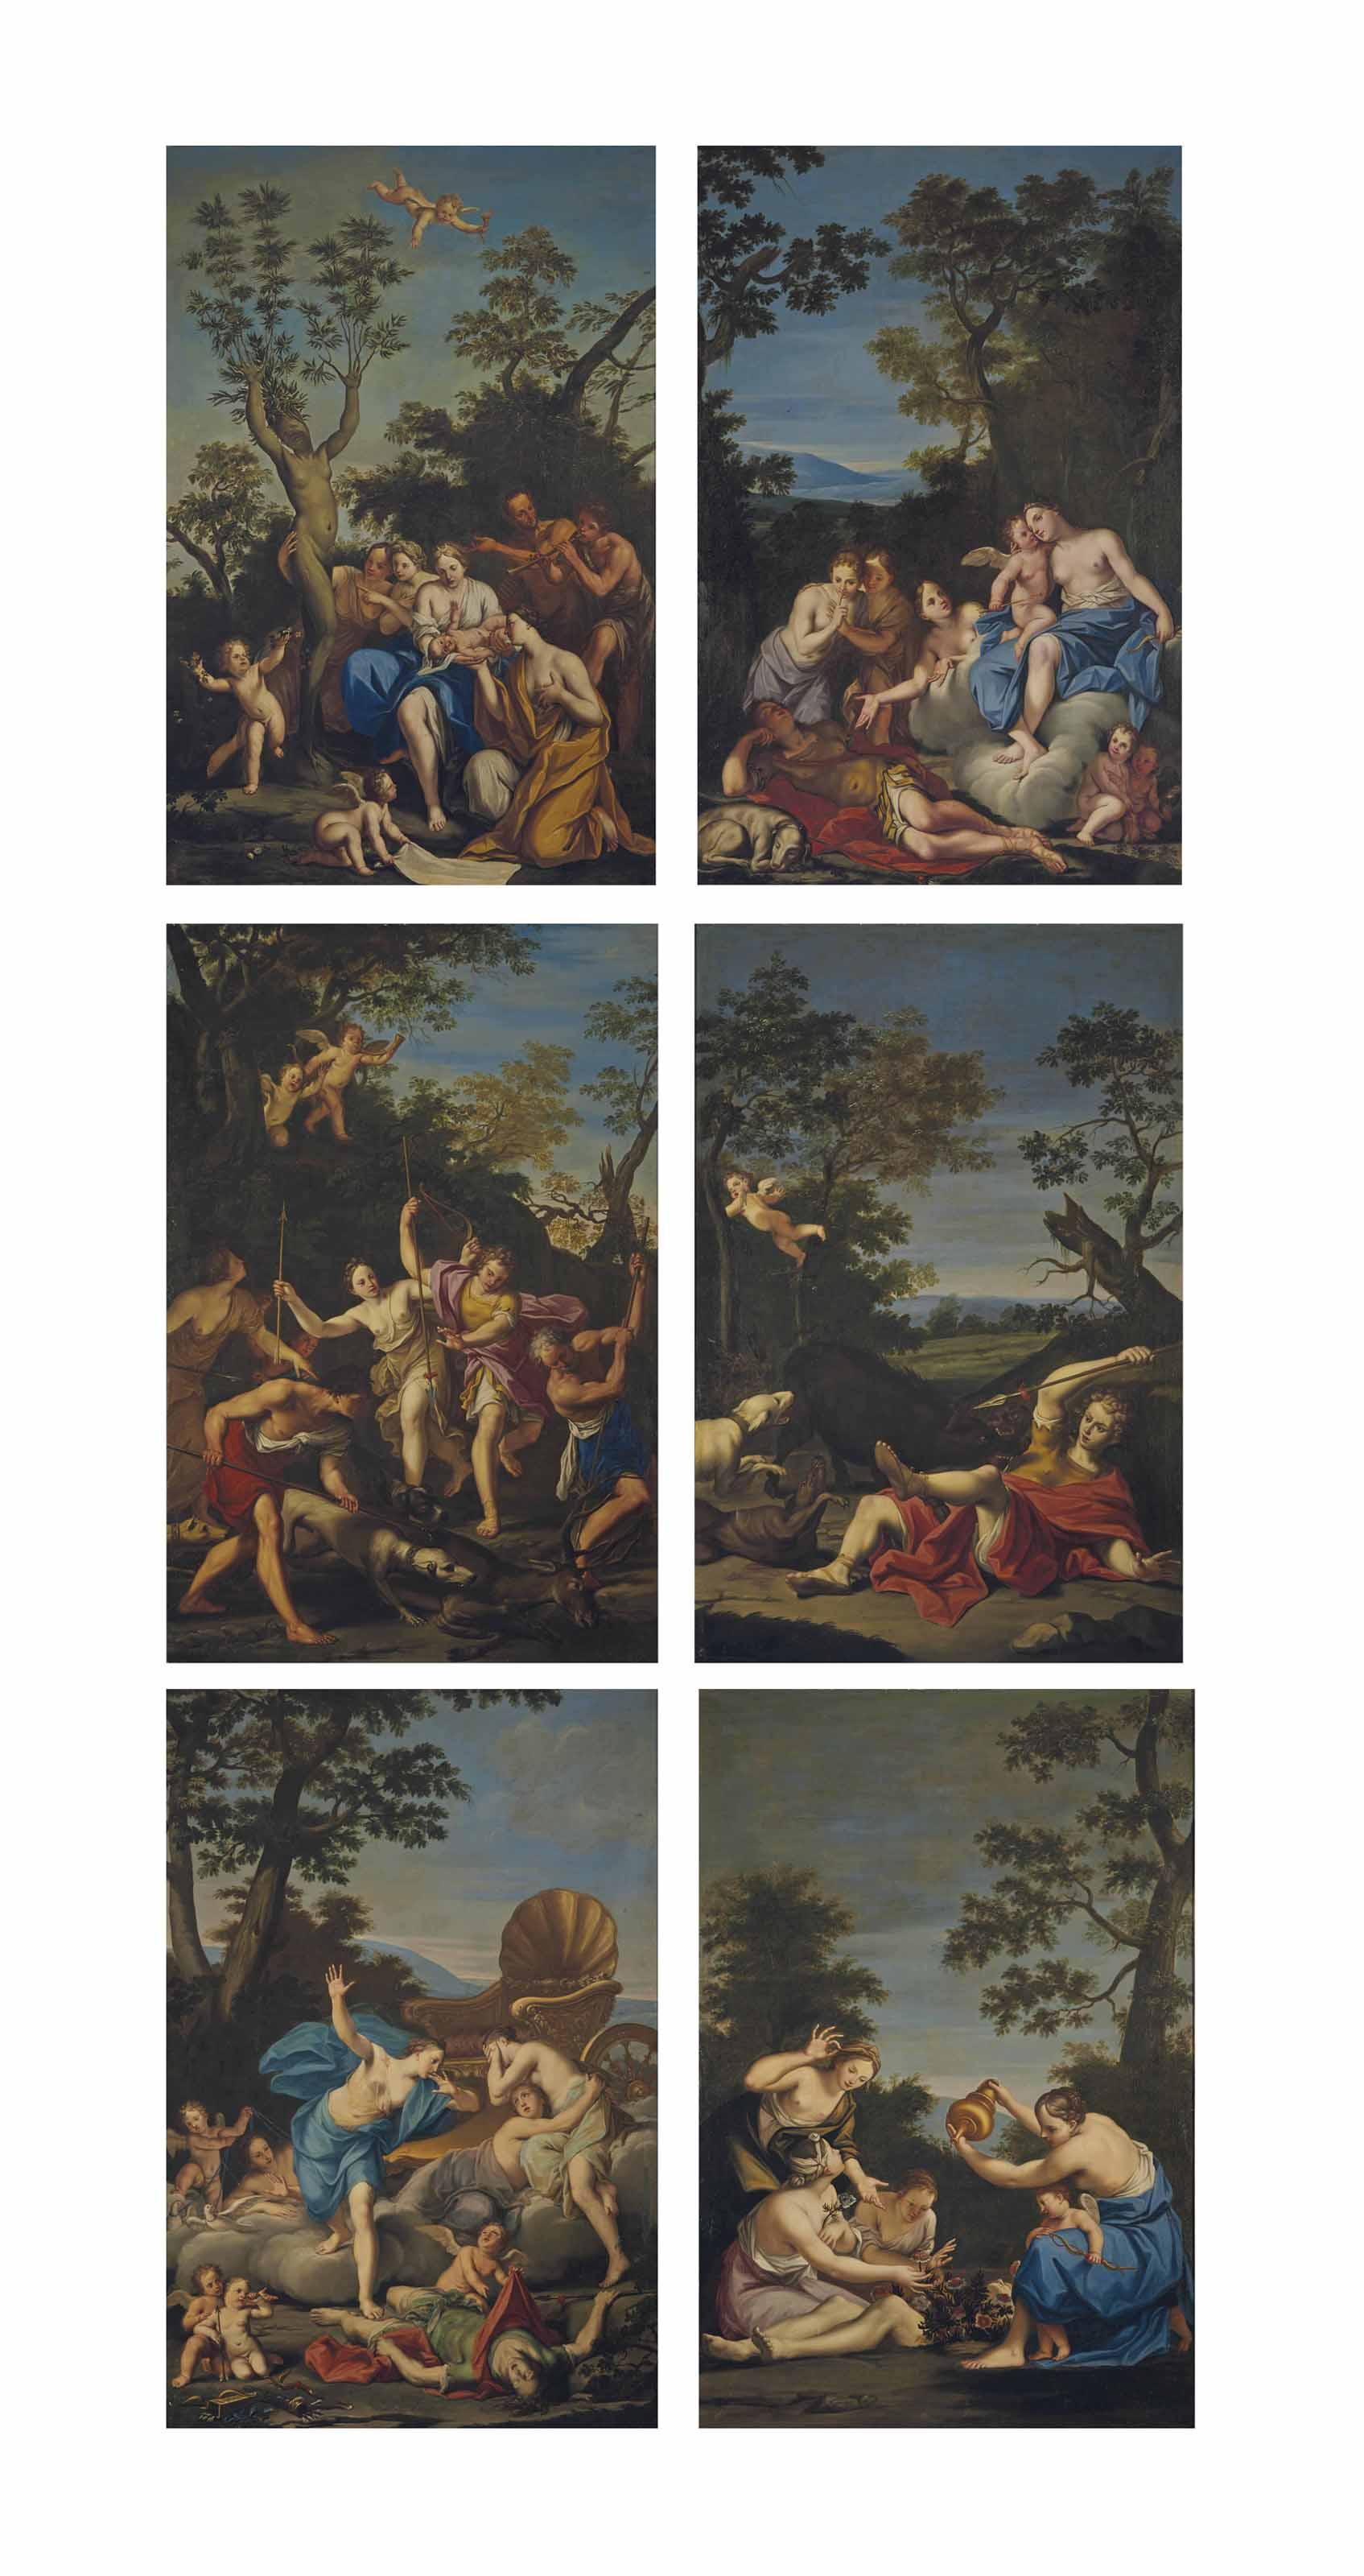 The Birth of Adonis; Venus enamoured of Adonis; Venus and Adonis hunting; Venus discovers the body of Adonis; The Death of Adonis; and Ablutions over the body of Adonis